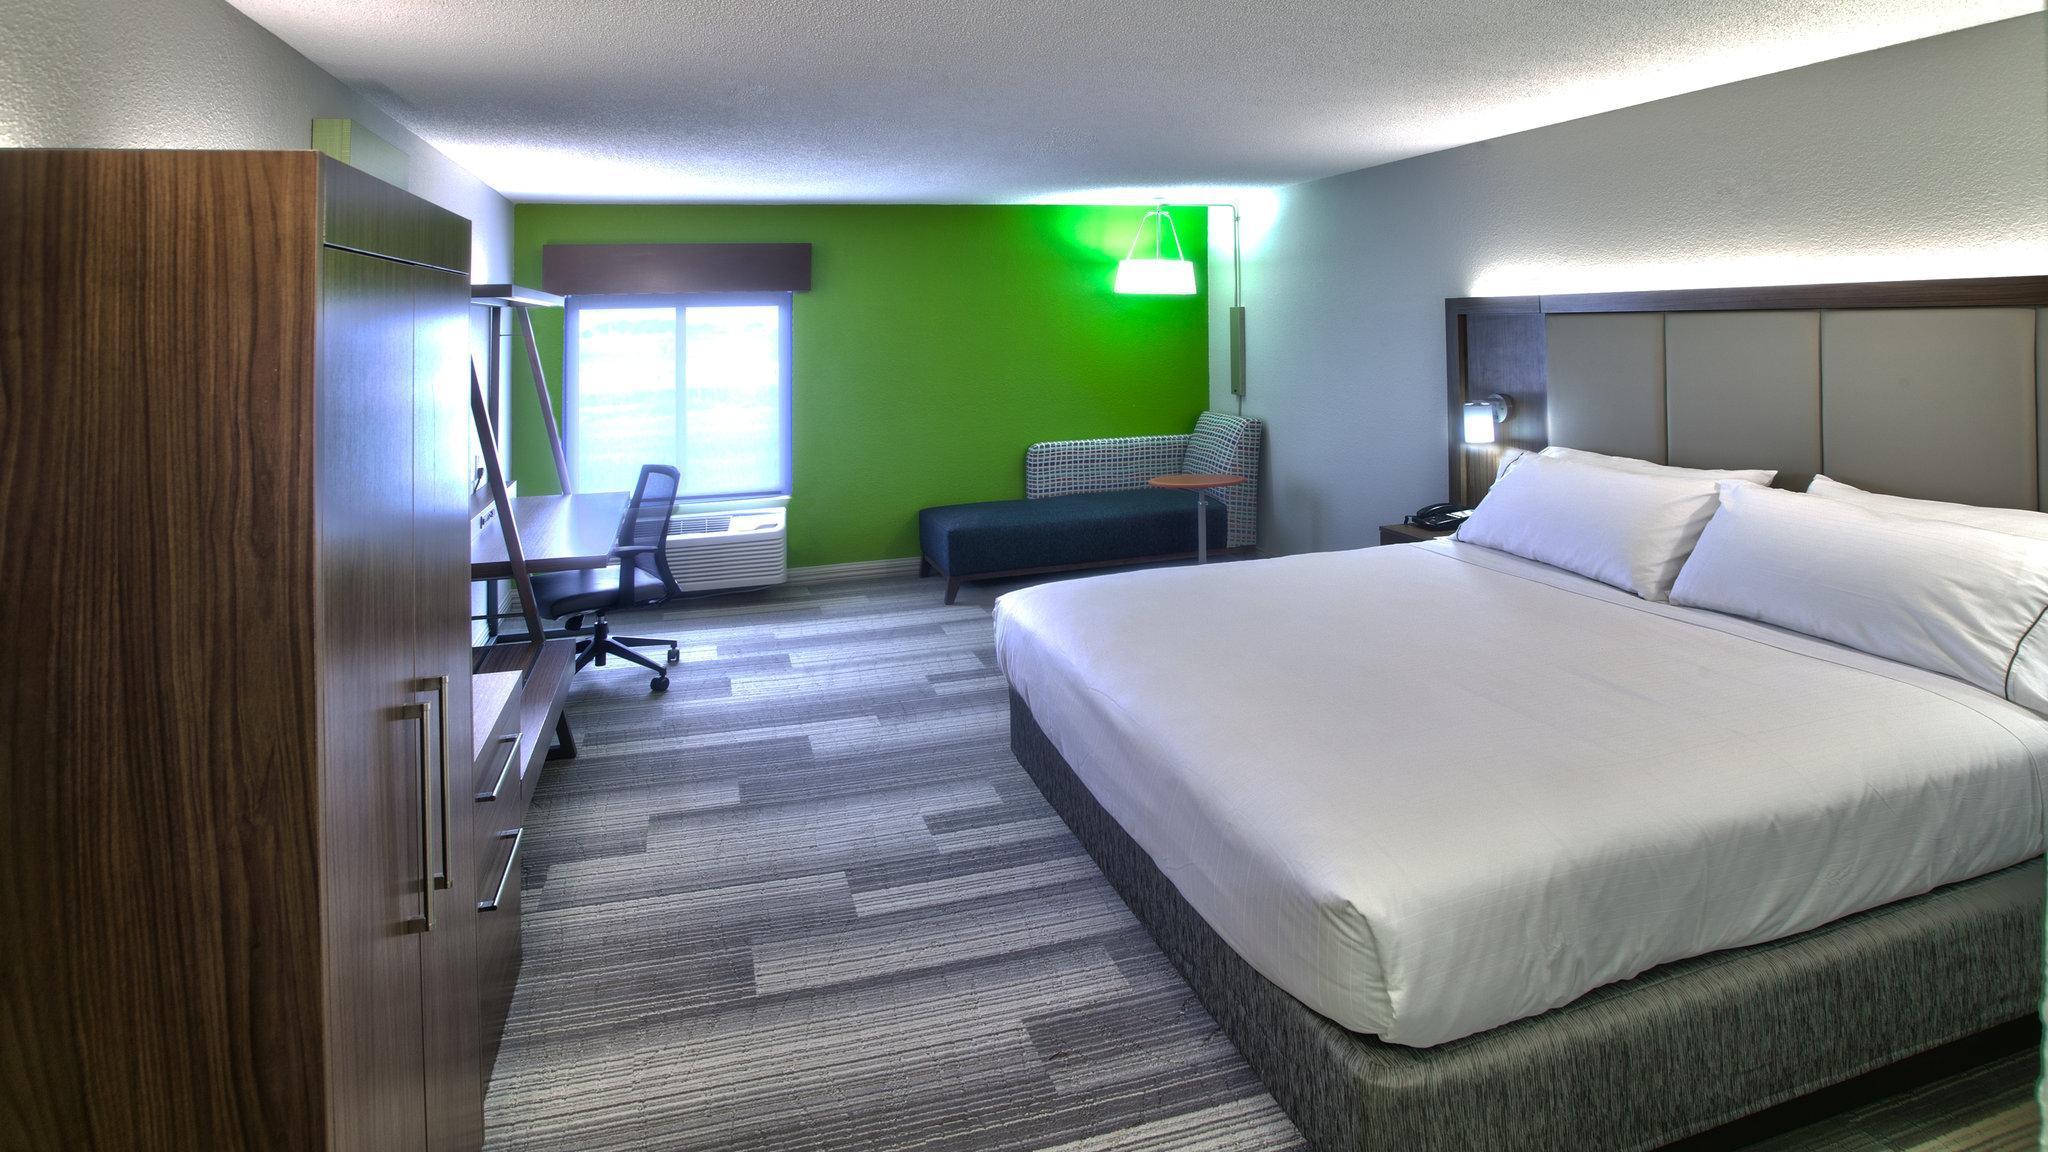 Holiday Inn Express & Suites Evansville North